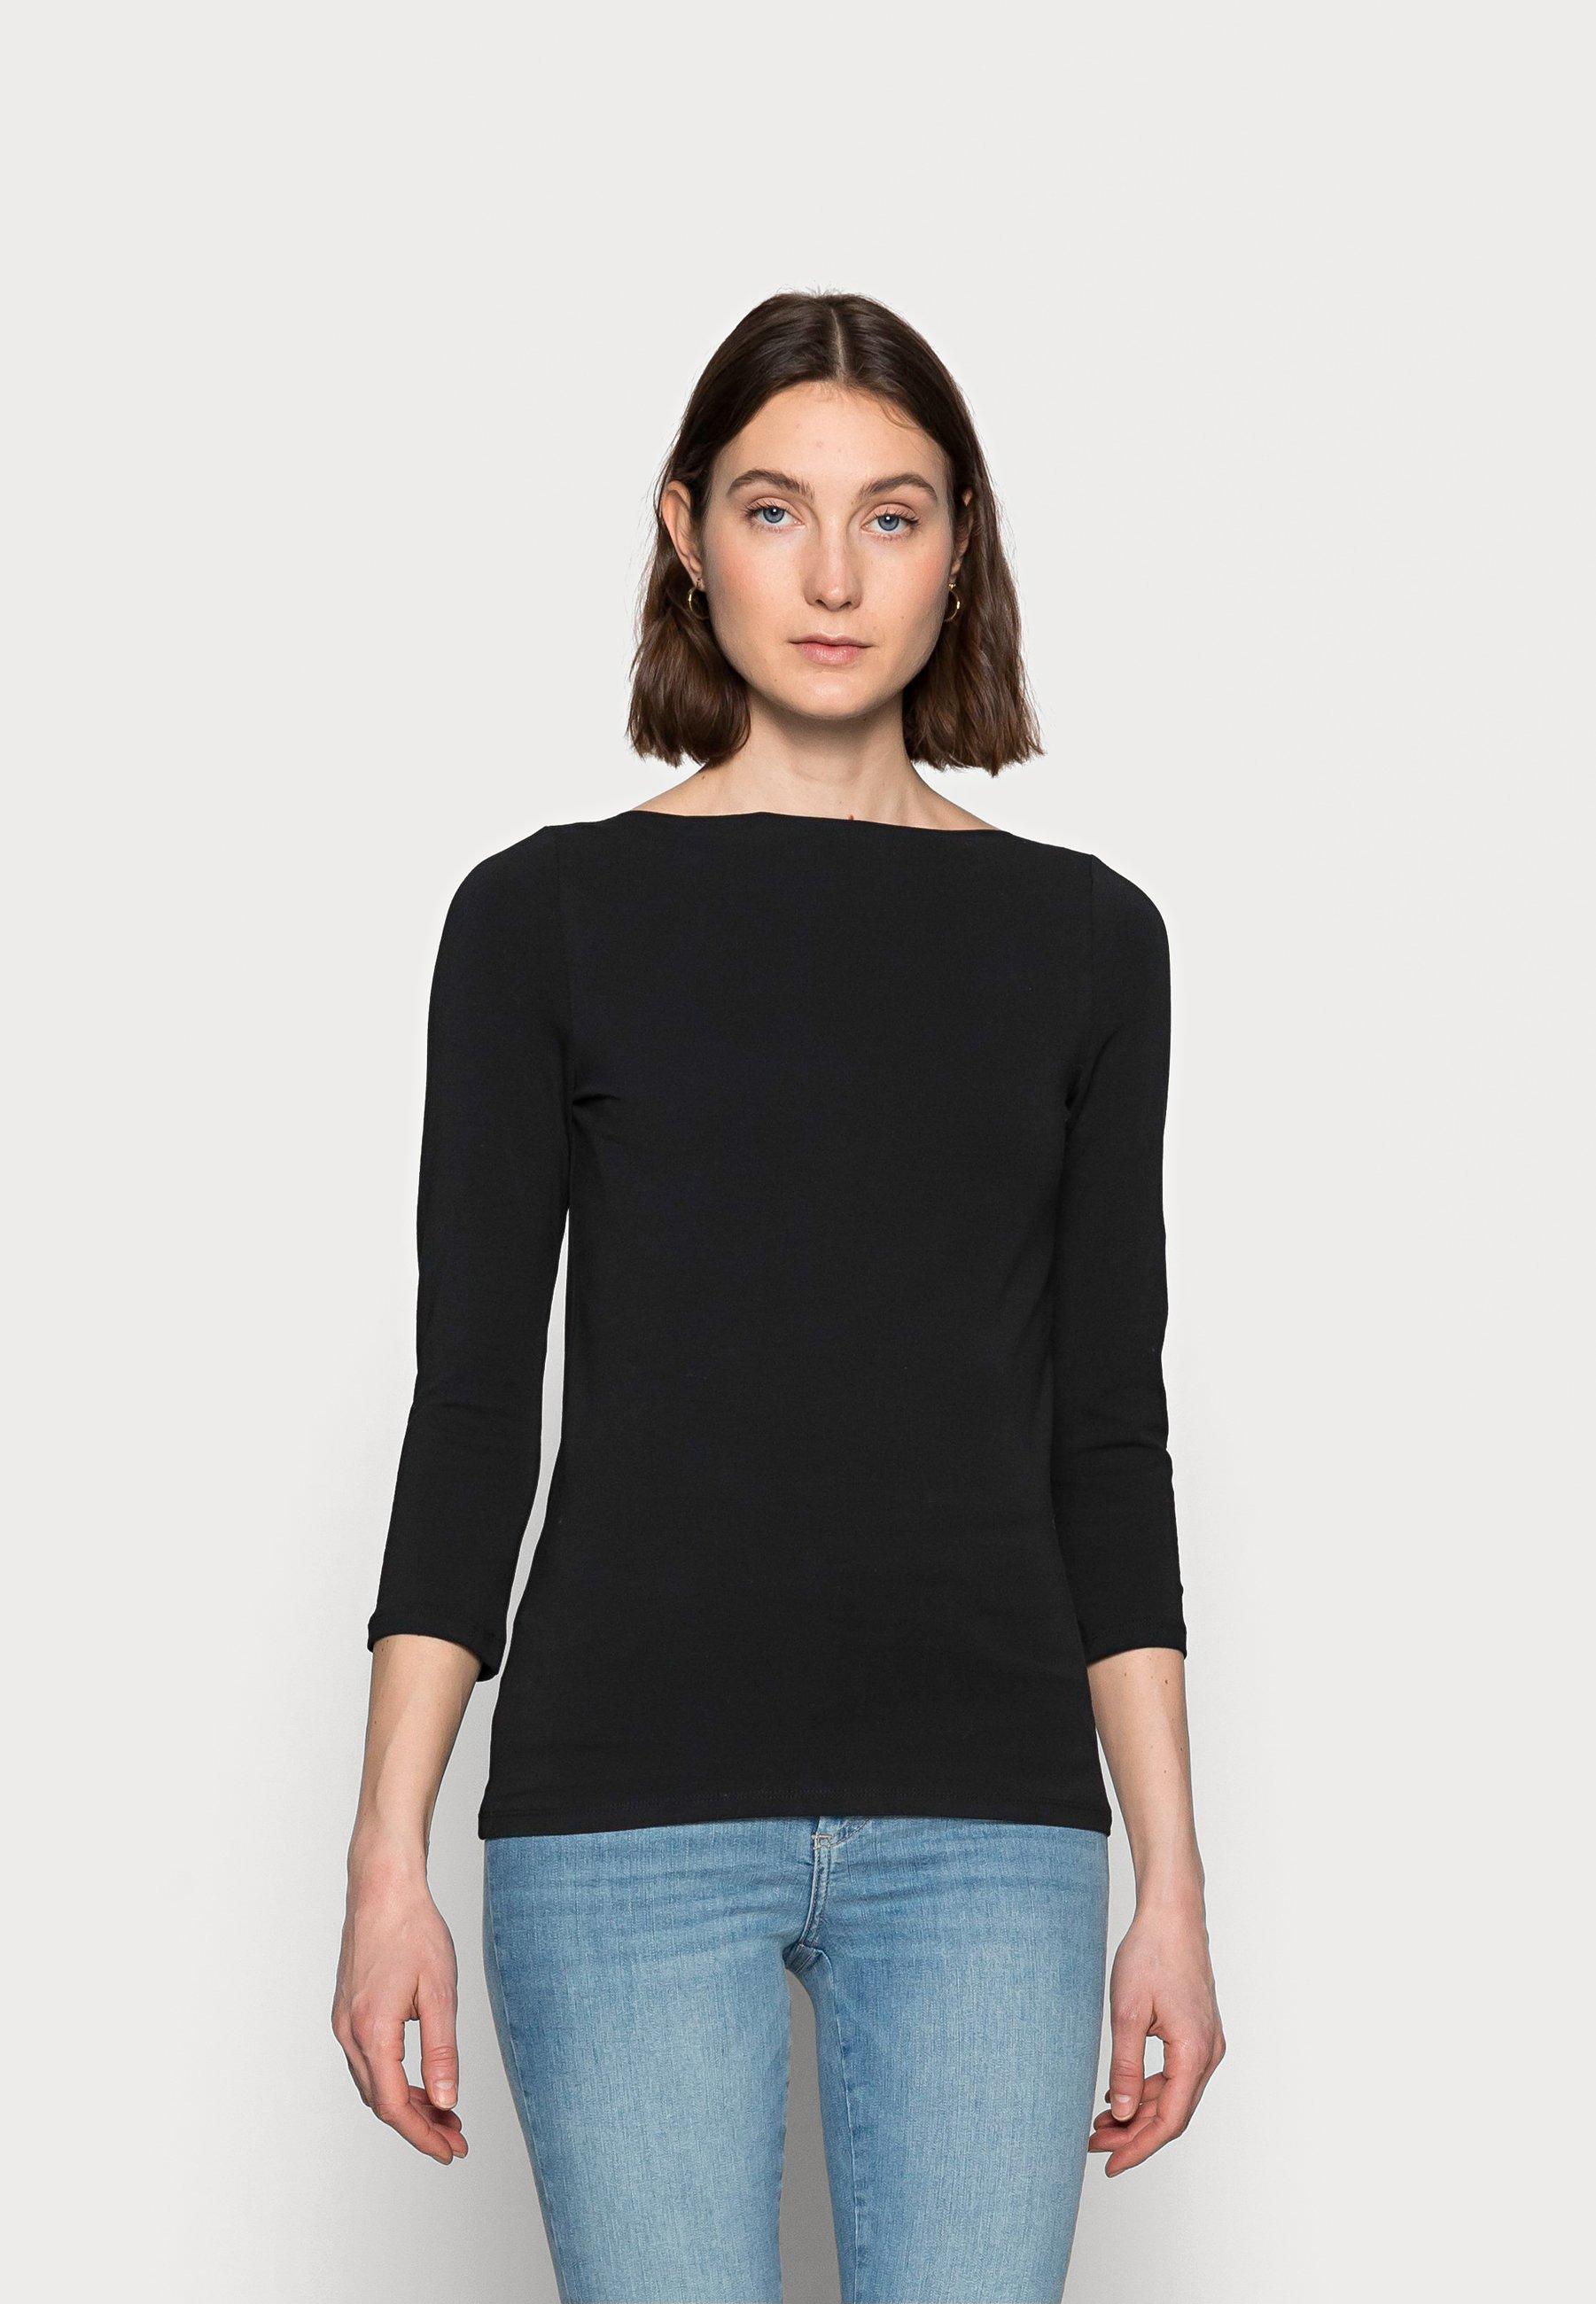 Femme ONLLIVE LOVE 3/4 BOATNECK - T-shirt à manches longues